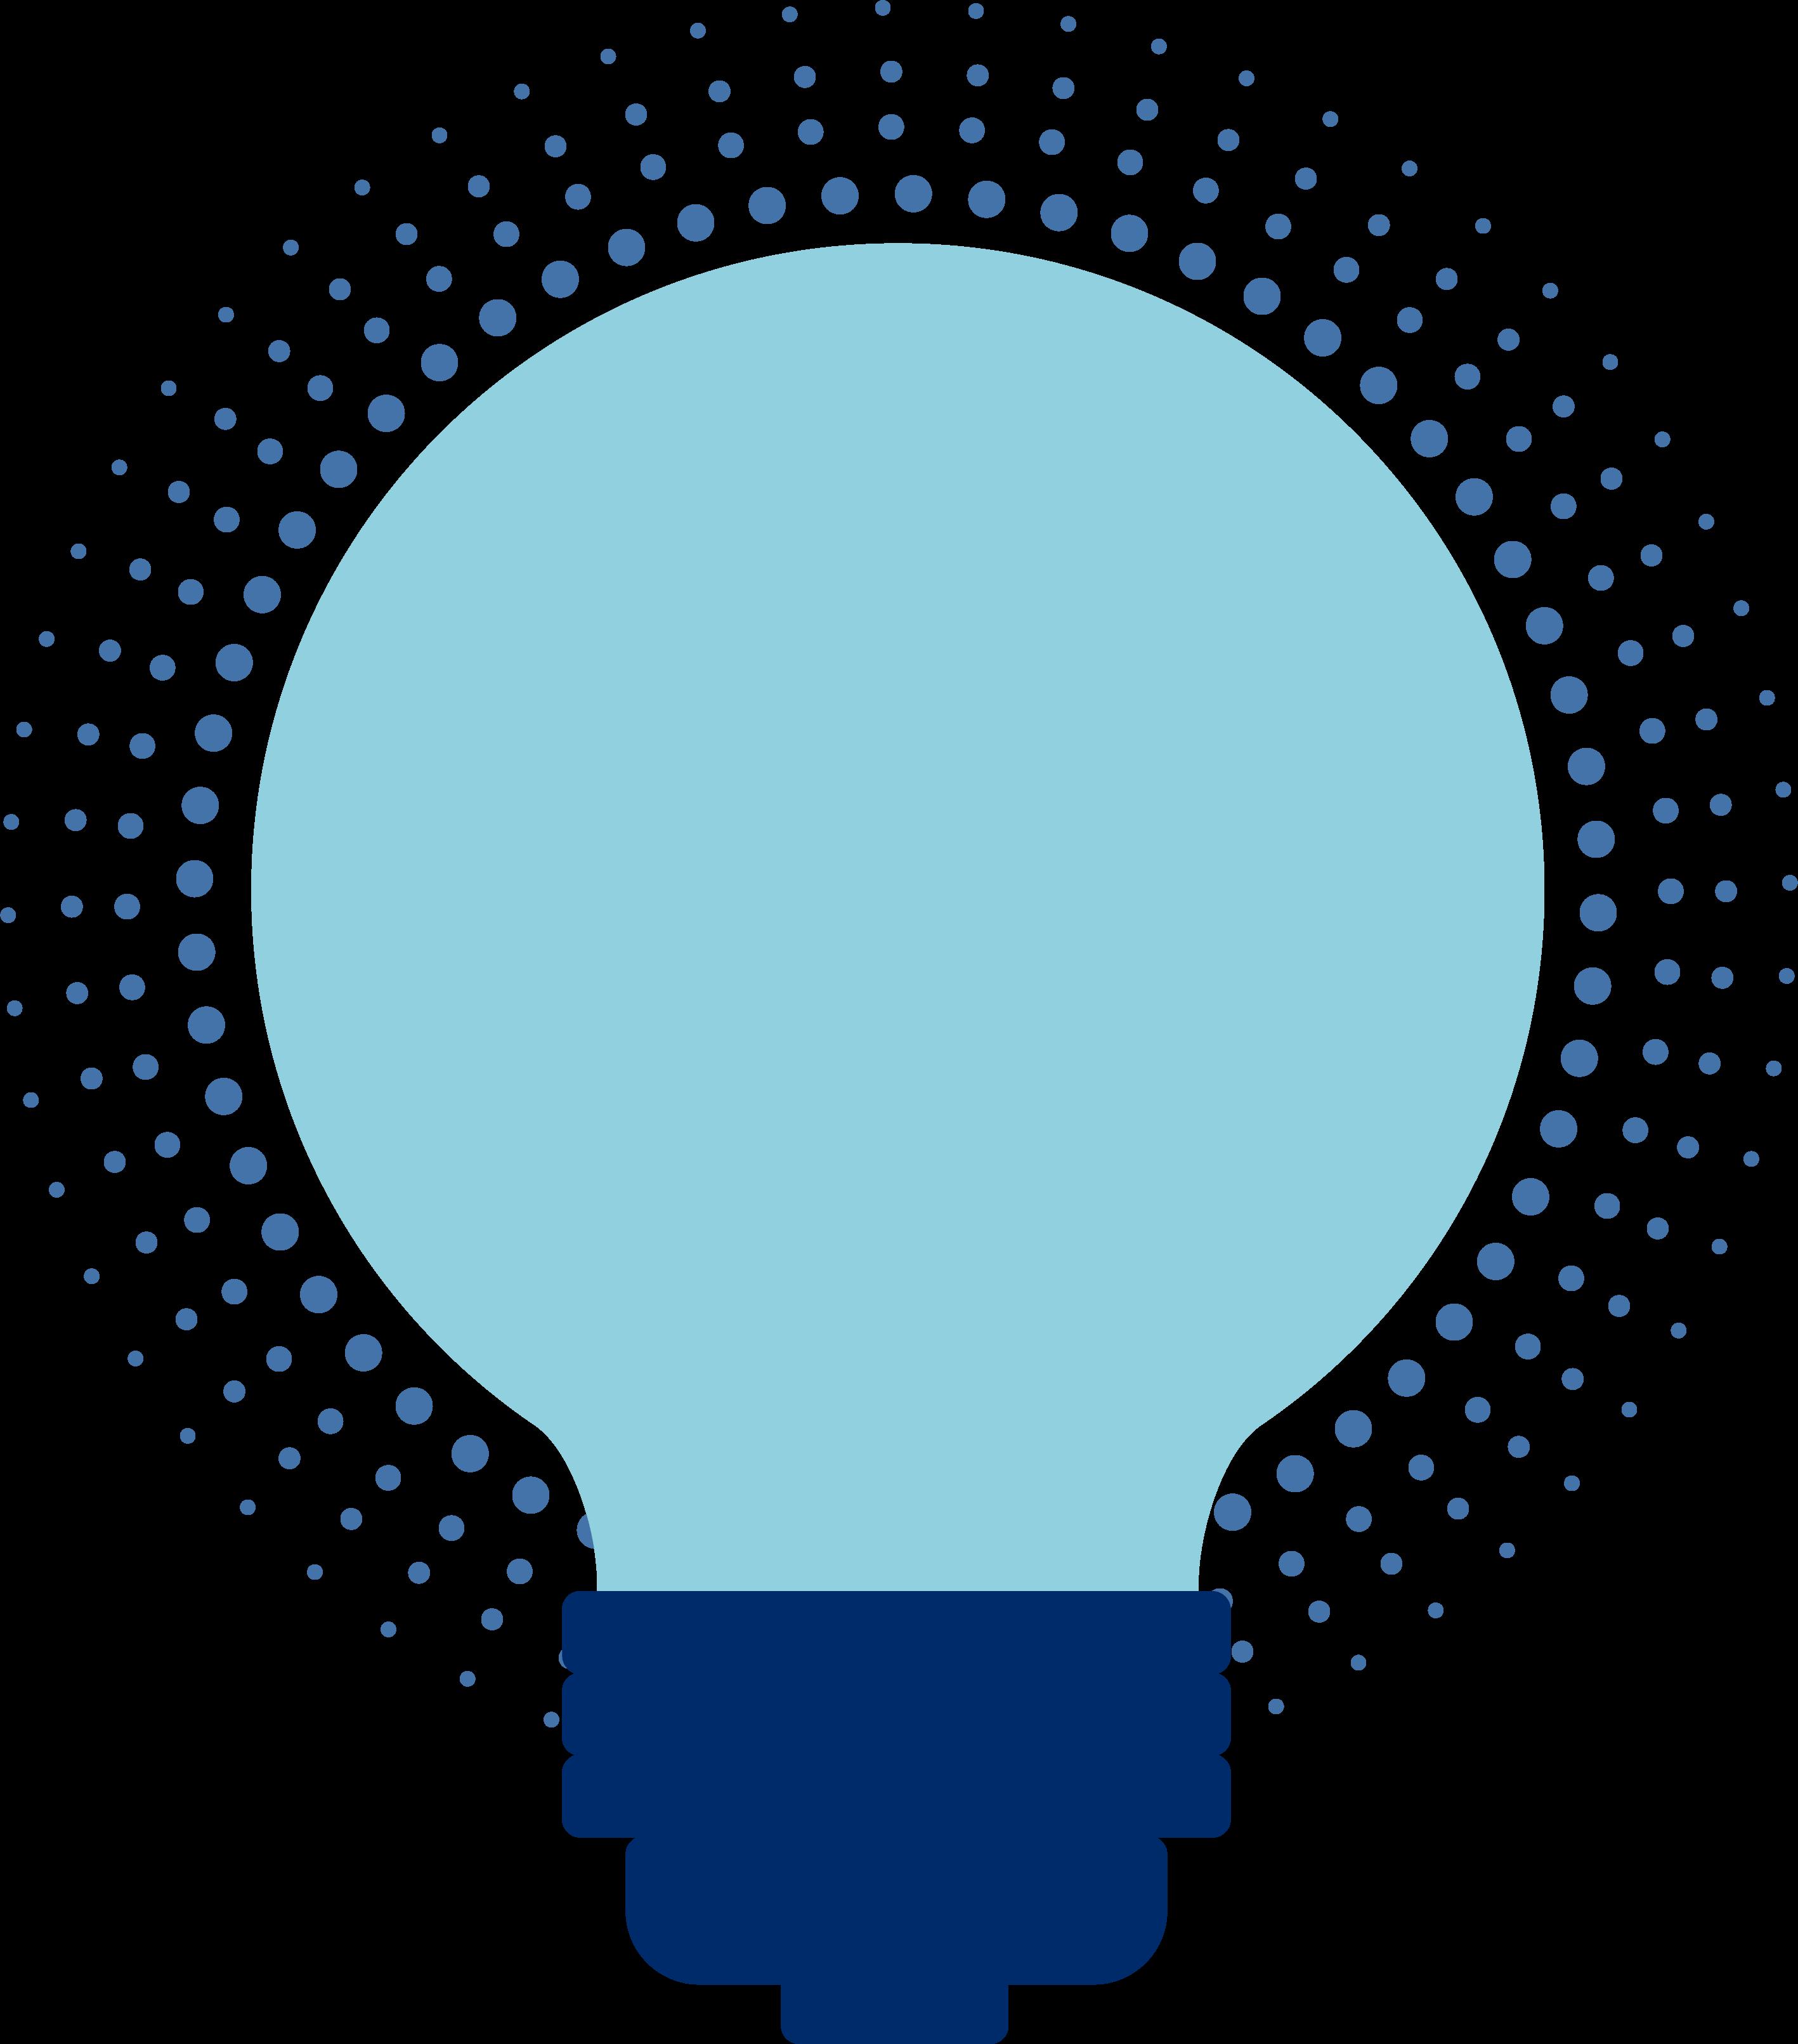 关于NORAK light bulb